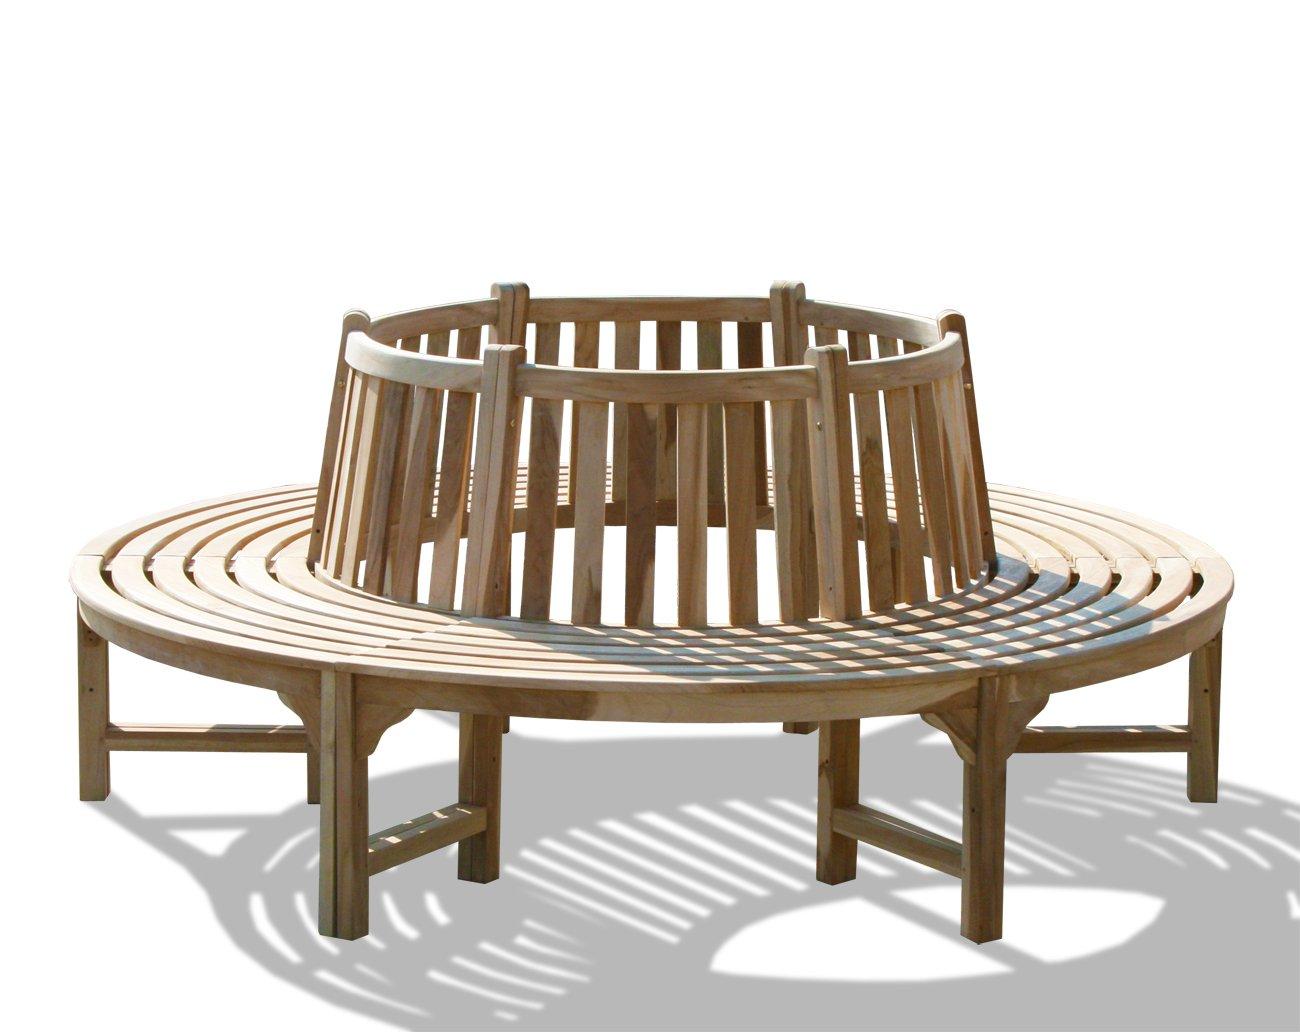 KMH®, 360° Baumbank (Kreis) mit Rückenlehne aus massivem Teakholz! (#102092)